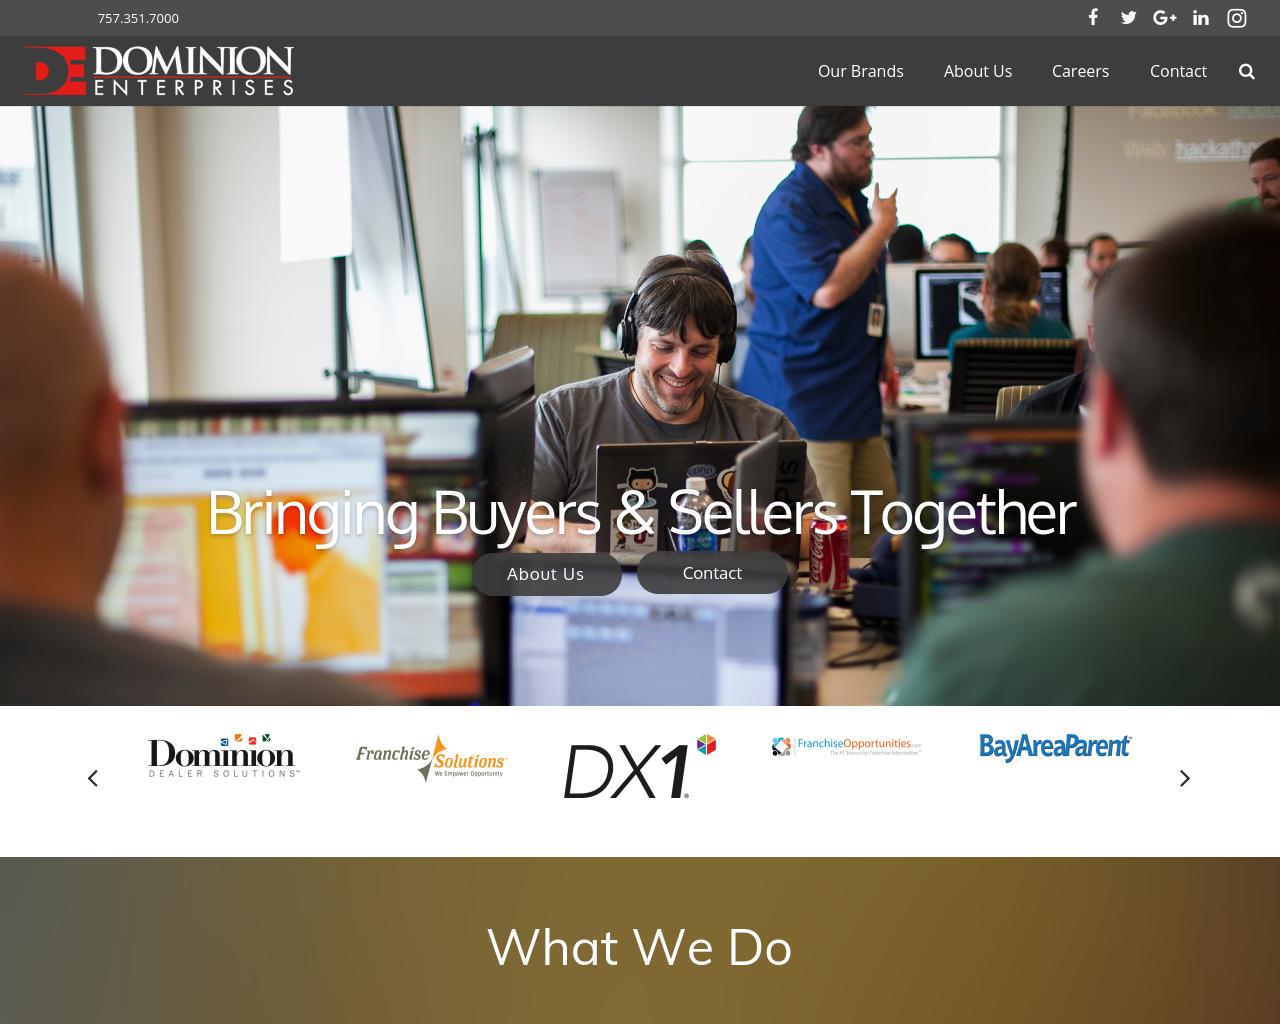 Dominion-Enterprises-Advertising-Reviews-Pricing